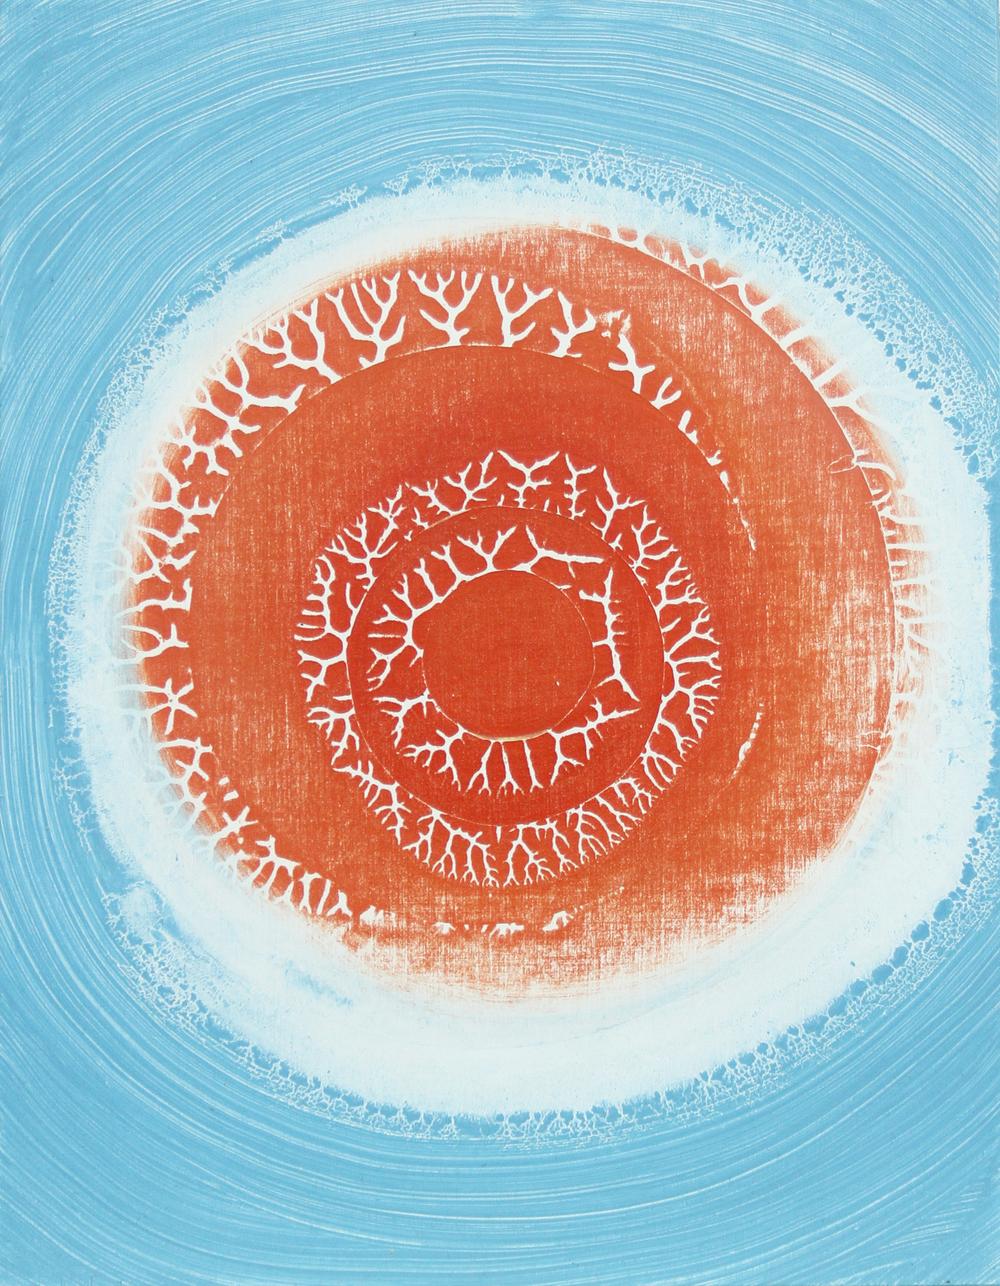 untitled, 2012, oil on panel, 12 x 9